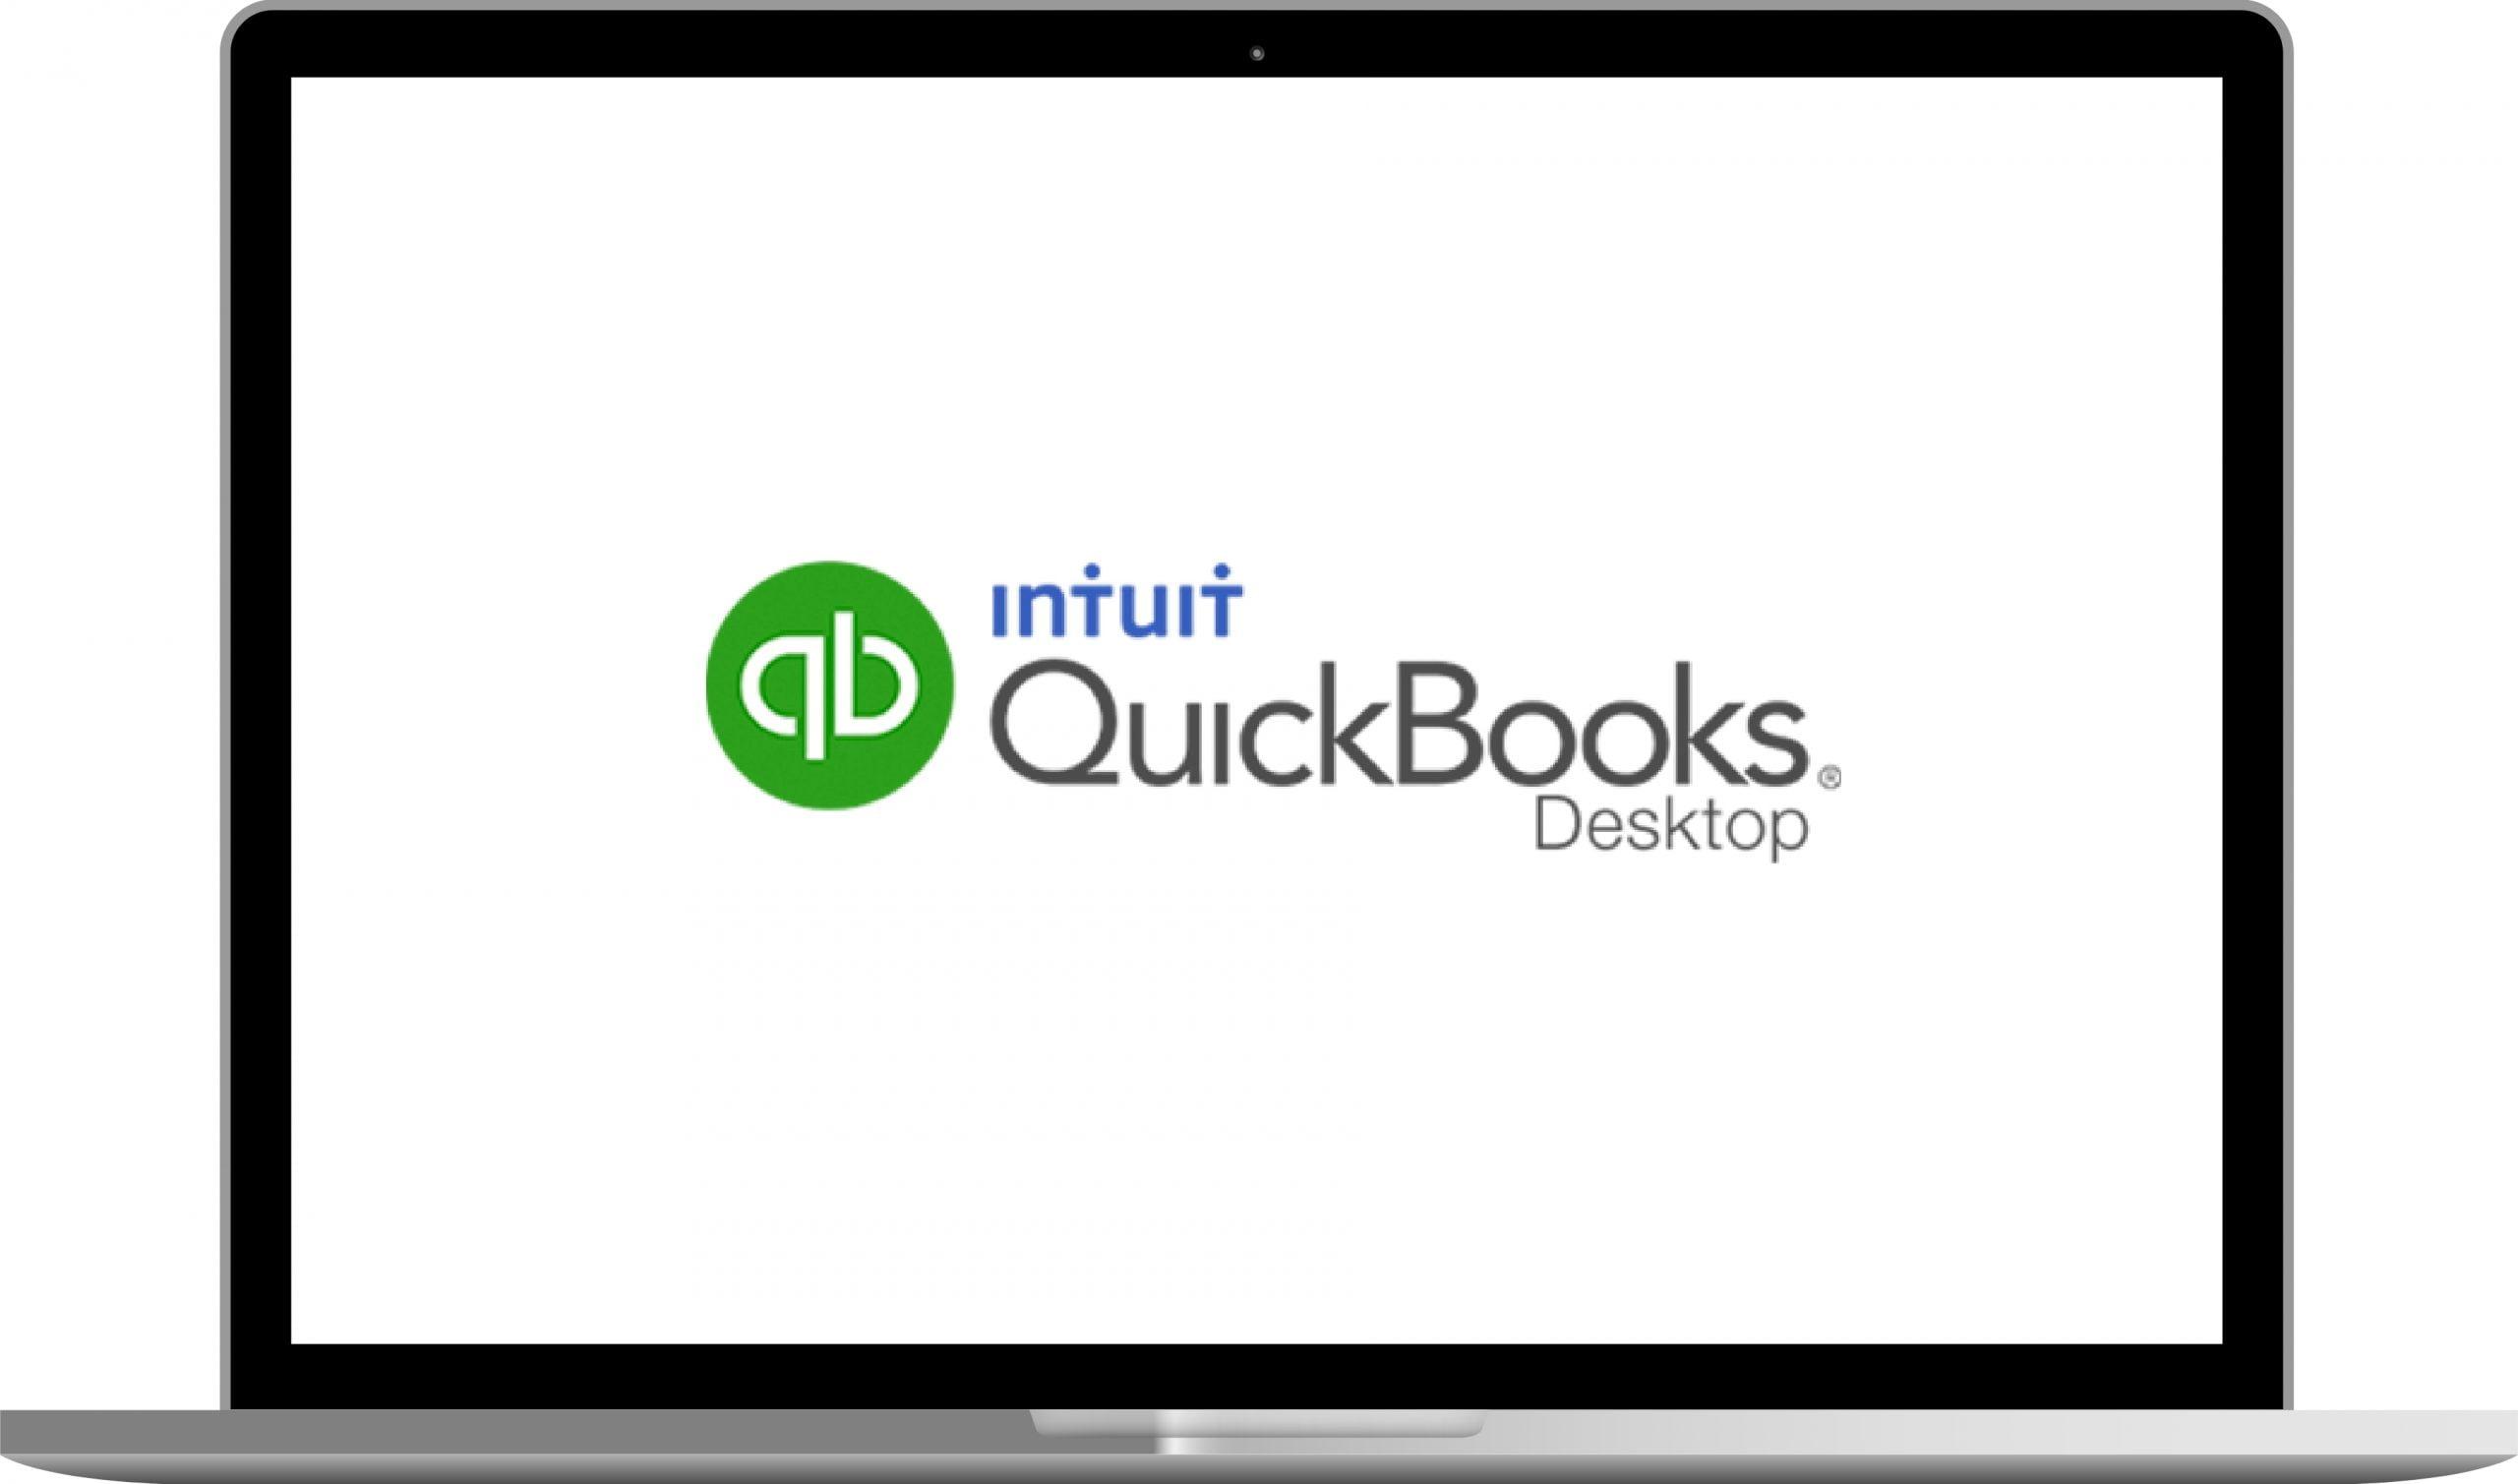 Quickbooks Desktop Integration with Projul